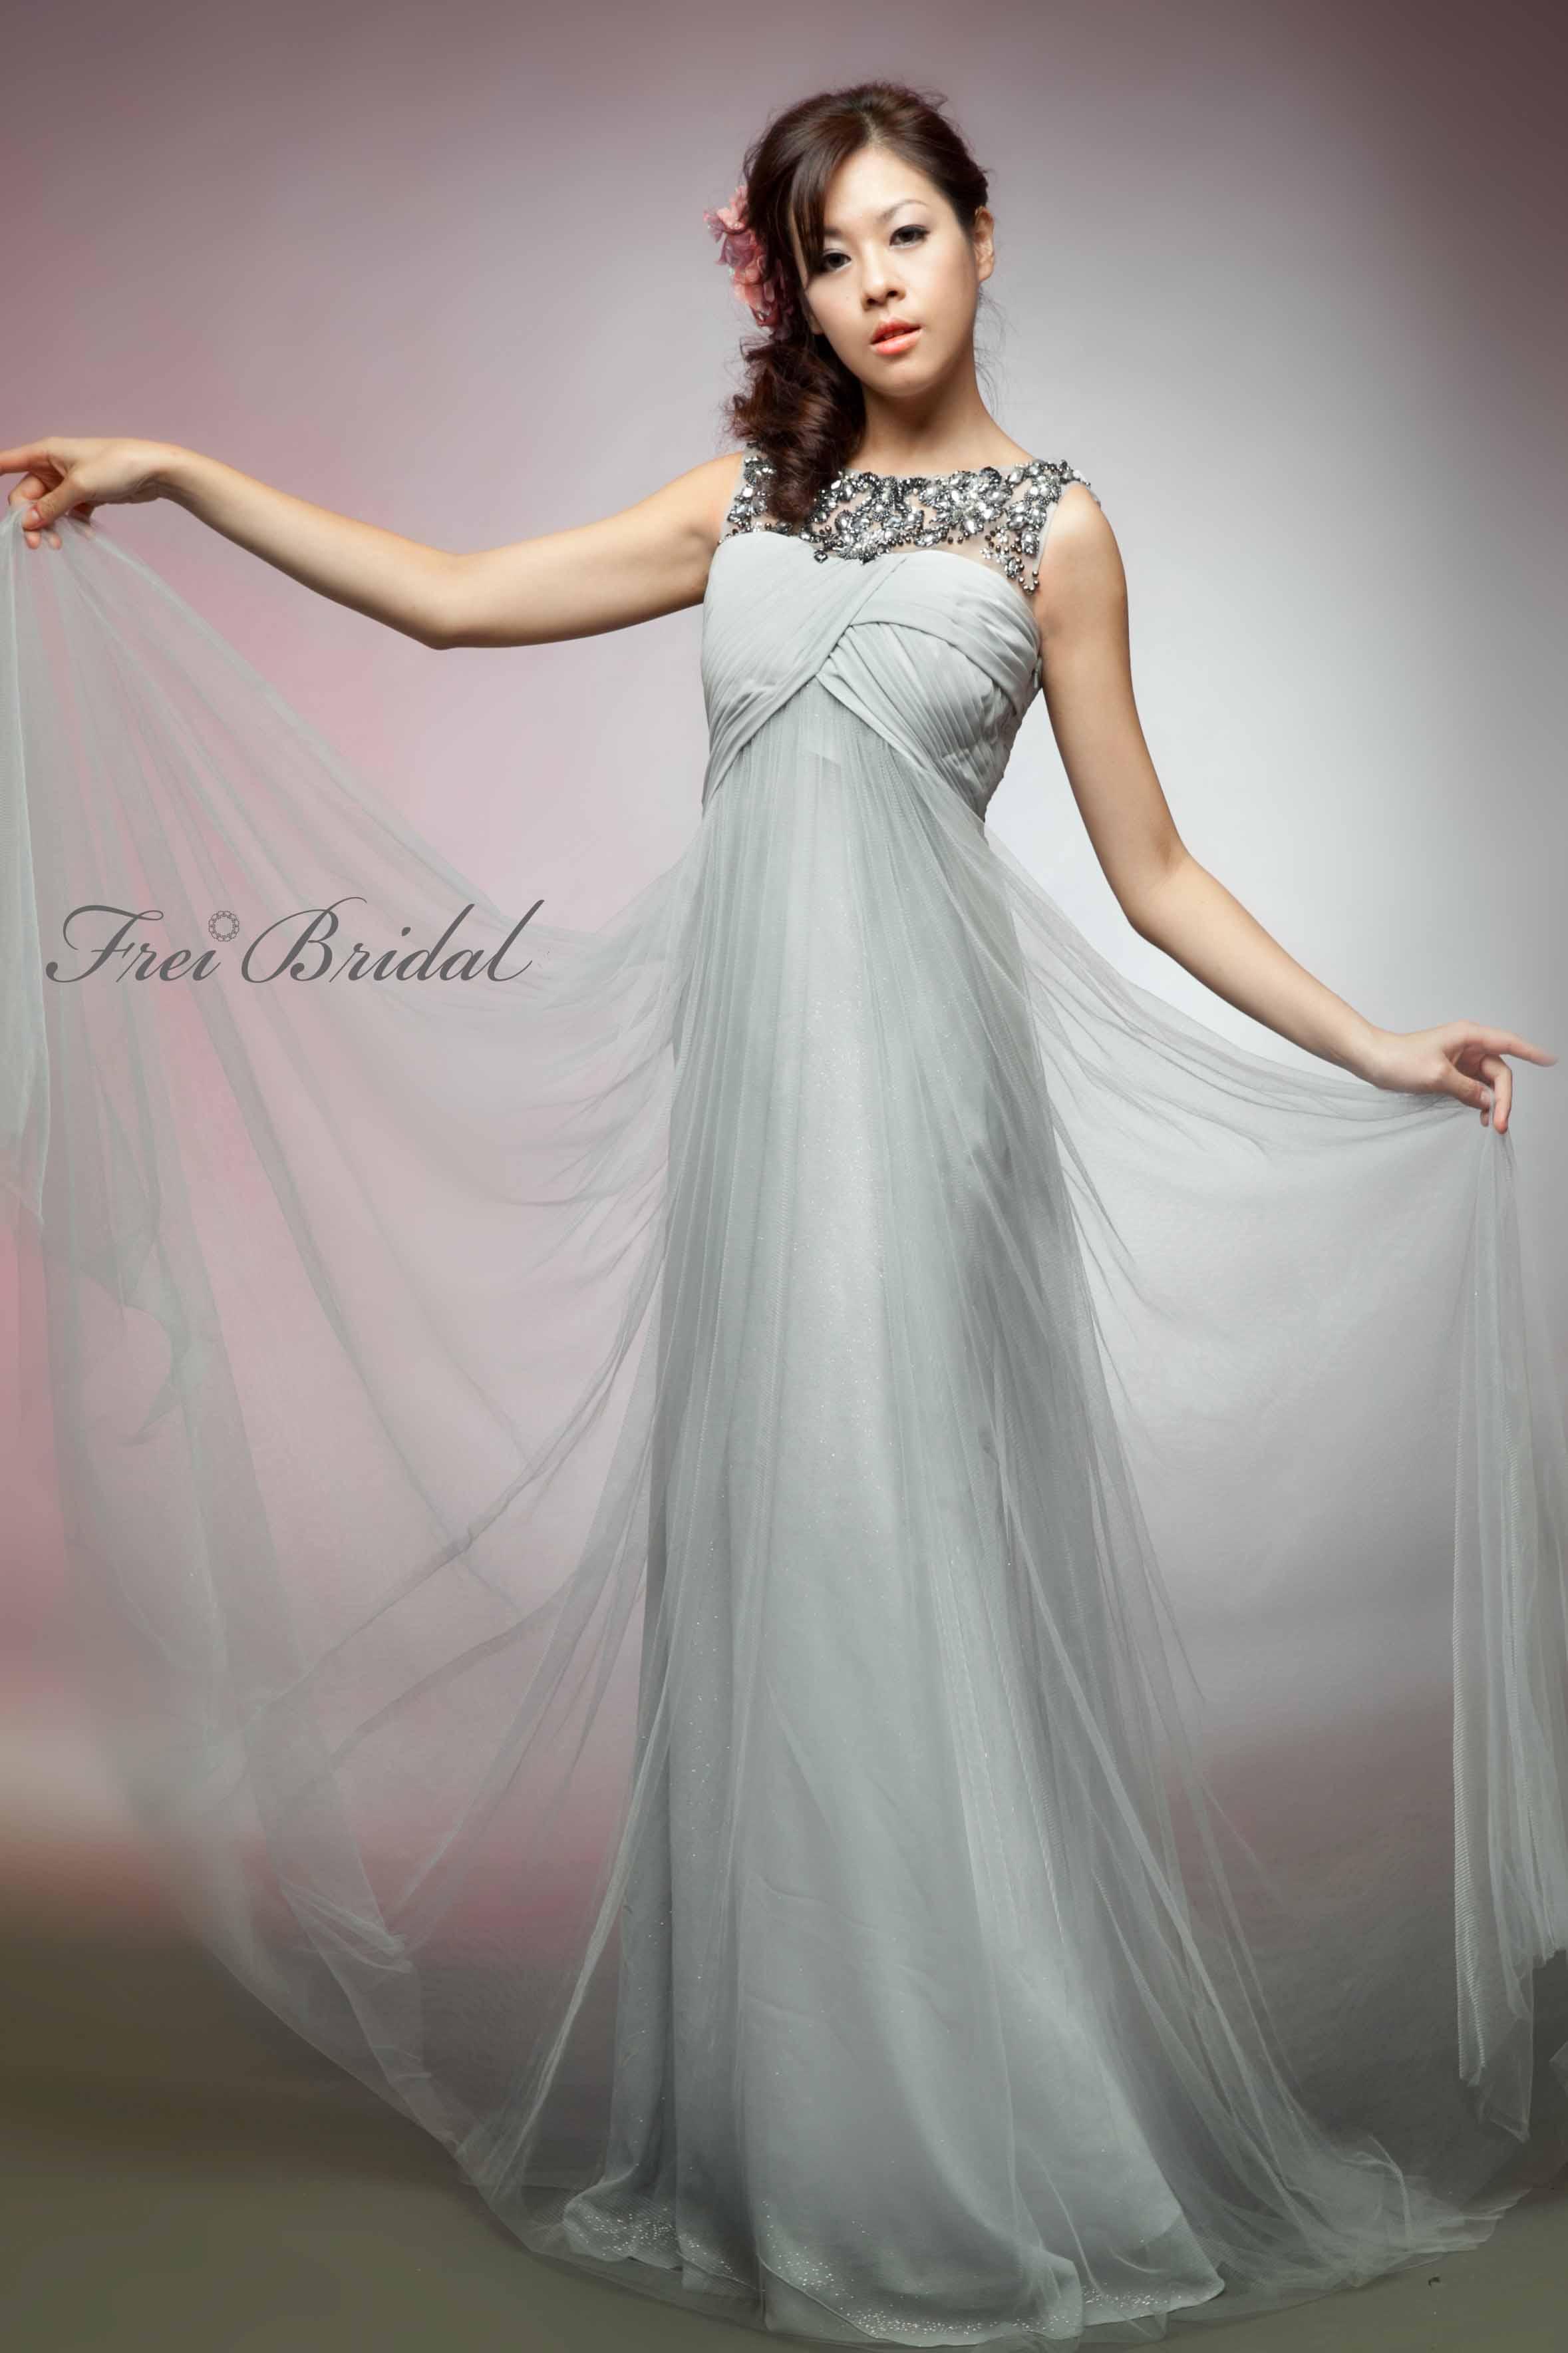 Lana C._111110-dress wan-IMG_9194-2-編輯-0_72ppi